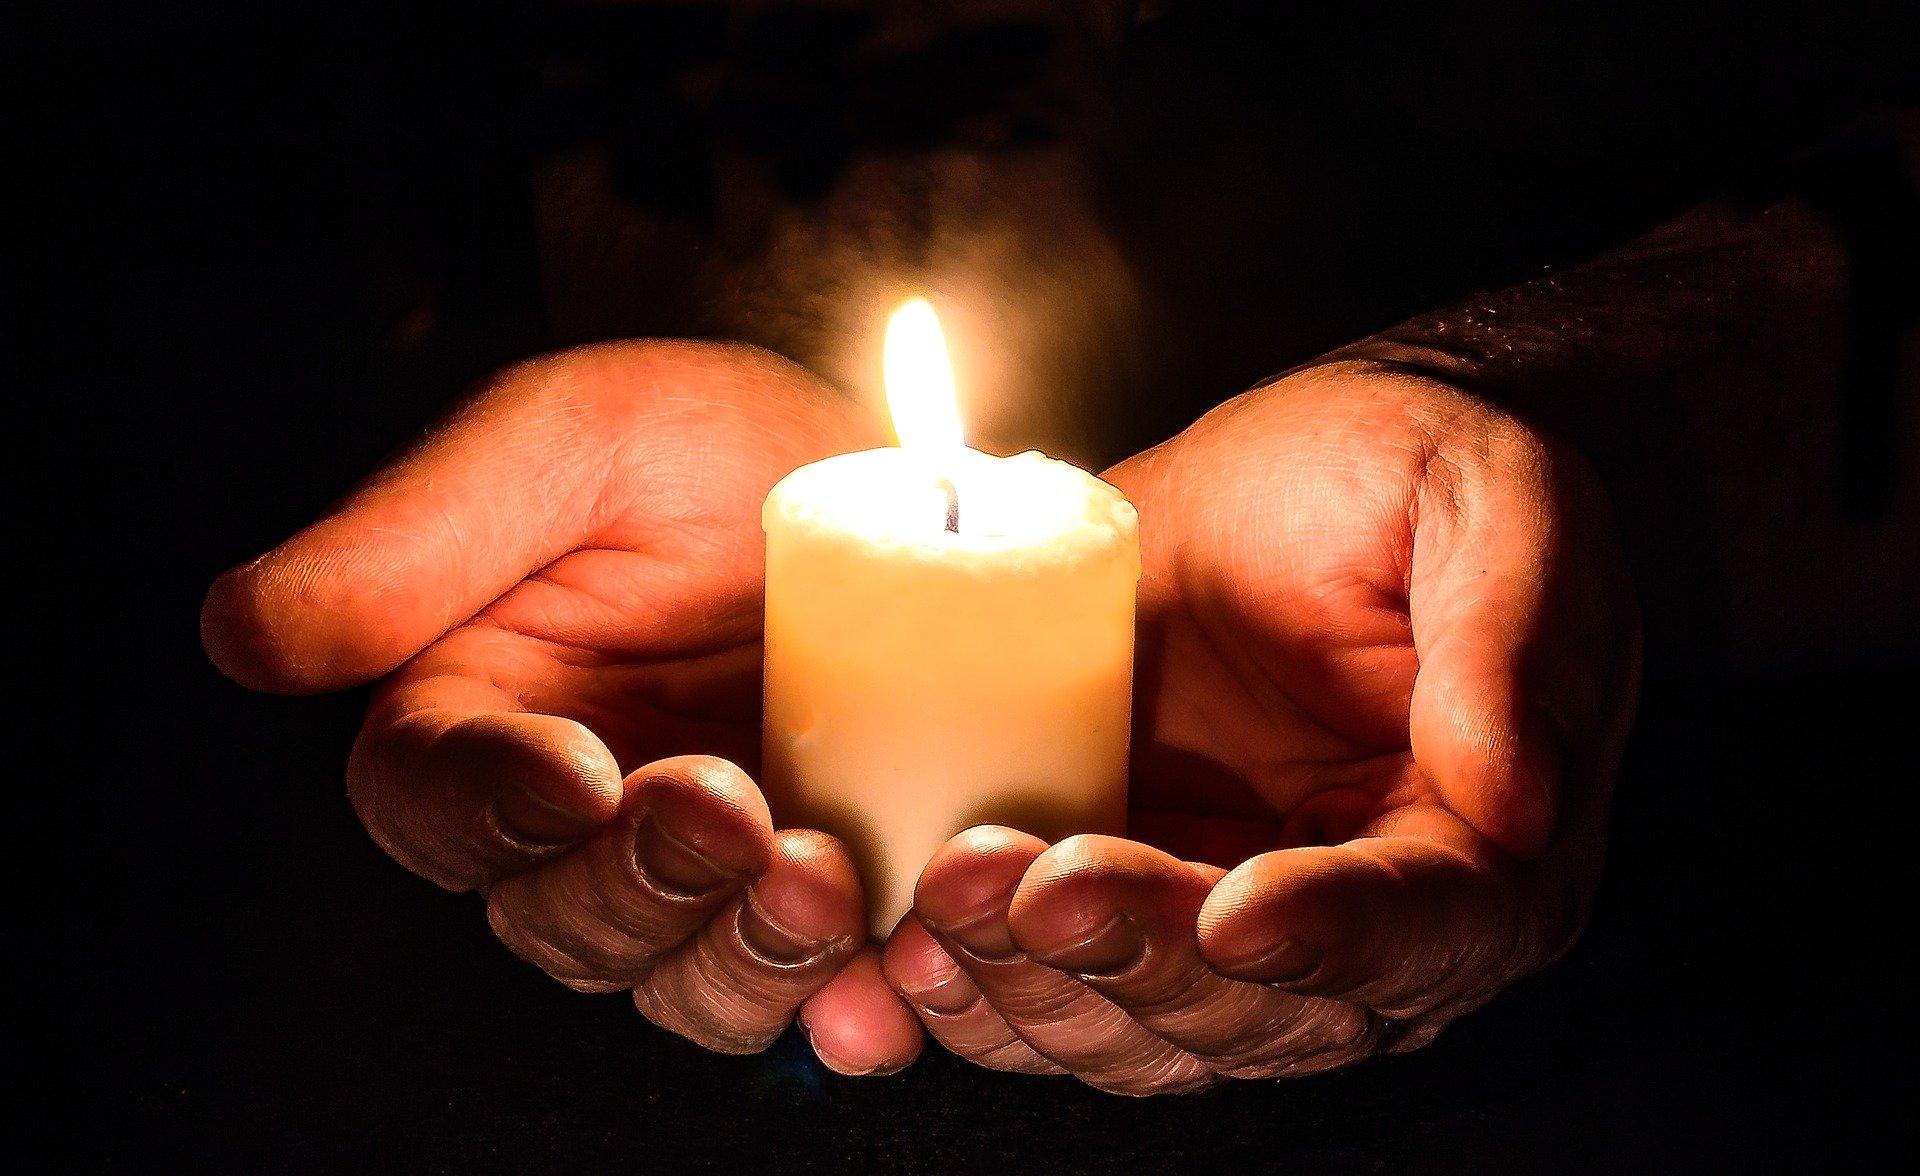 PG Hillesheim Gebet am Donnerstag Quelle: ©Myriams-Fotos - pixabay.com